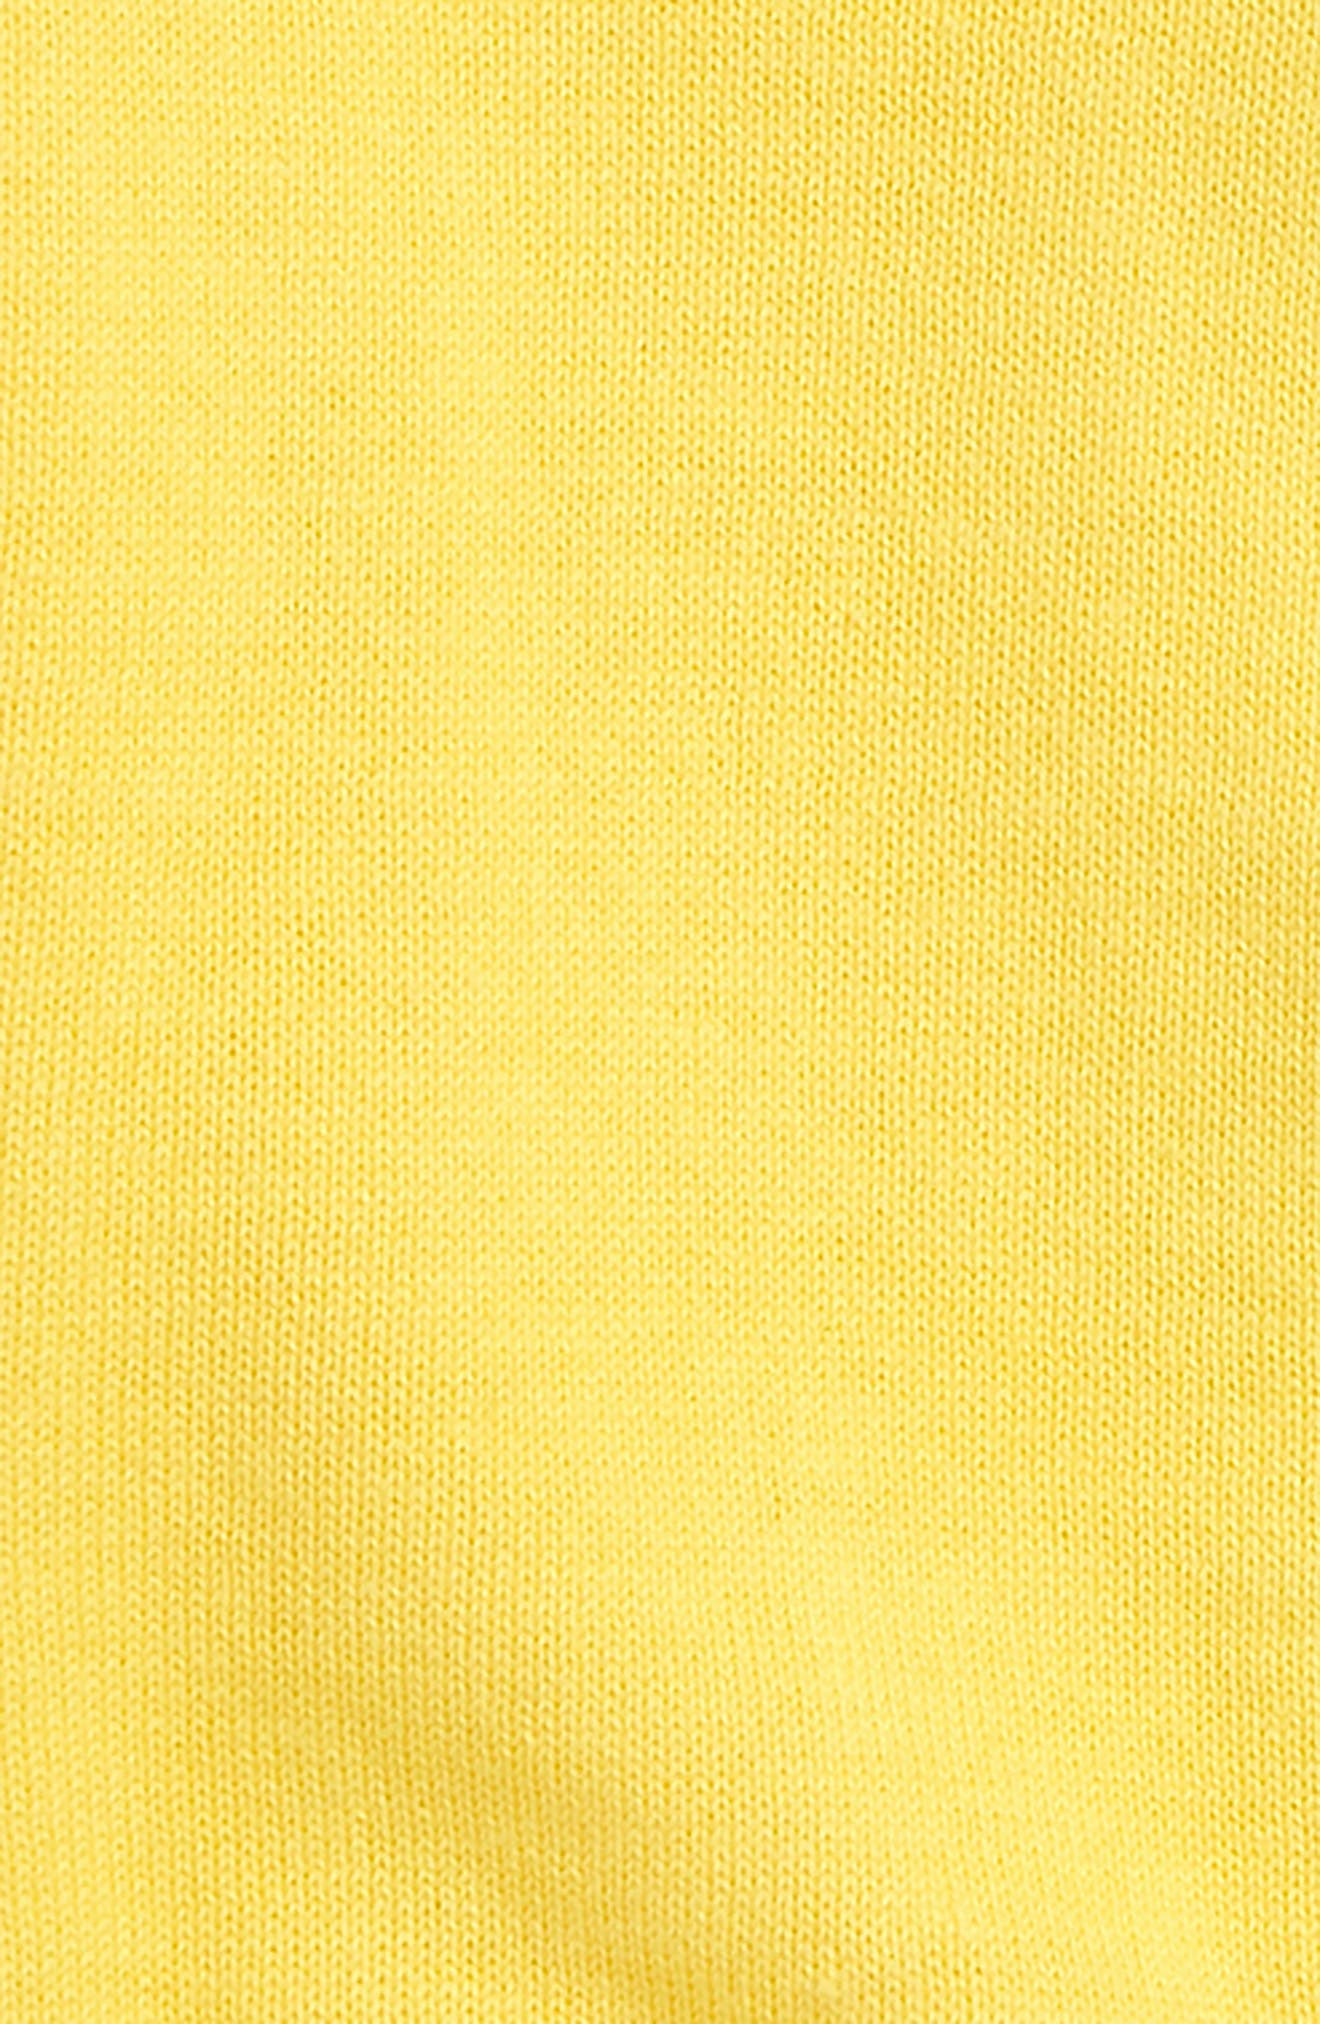 Alternate Image 2  - SOOKIbaby True Knit Lemon Cardigan (Baby & Toddler)